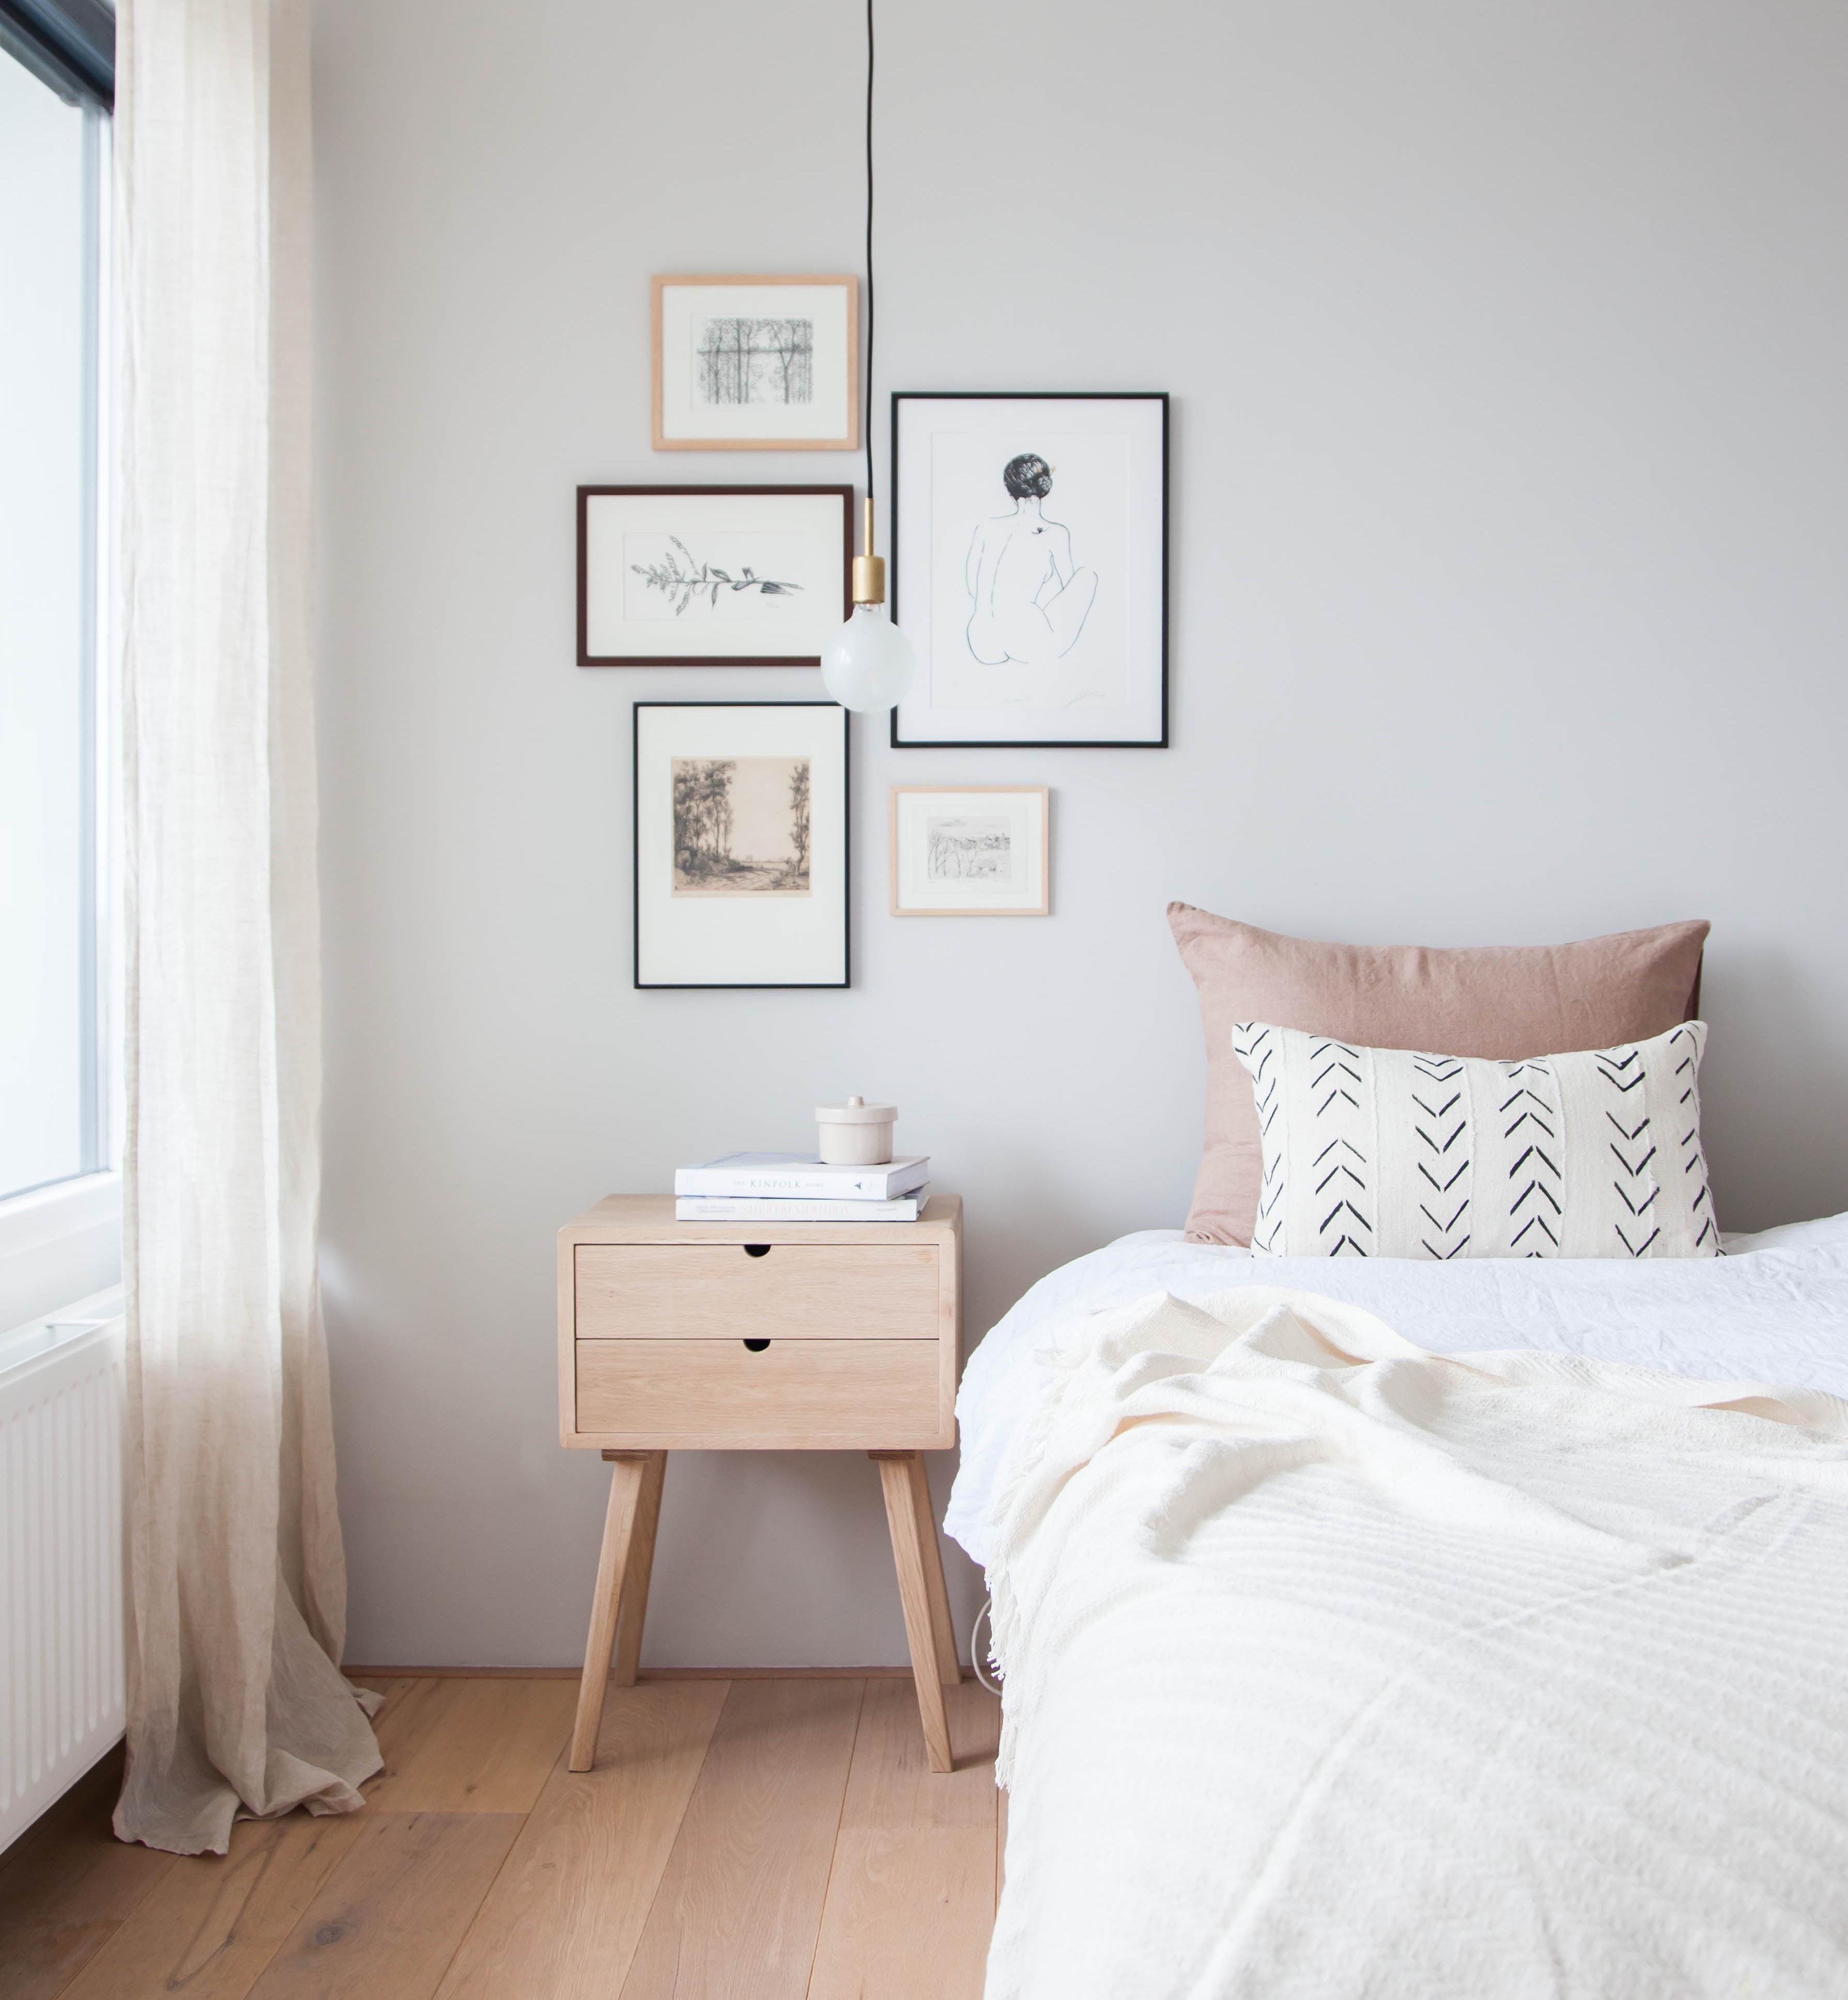 Bedroom inspo sidebarmostpopularposts Minimal DecorNeutral